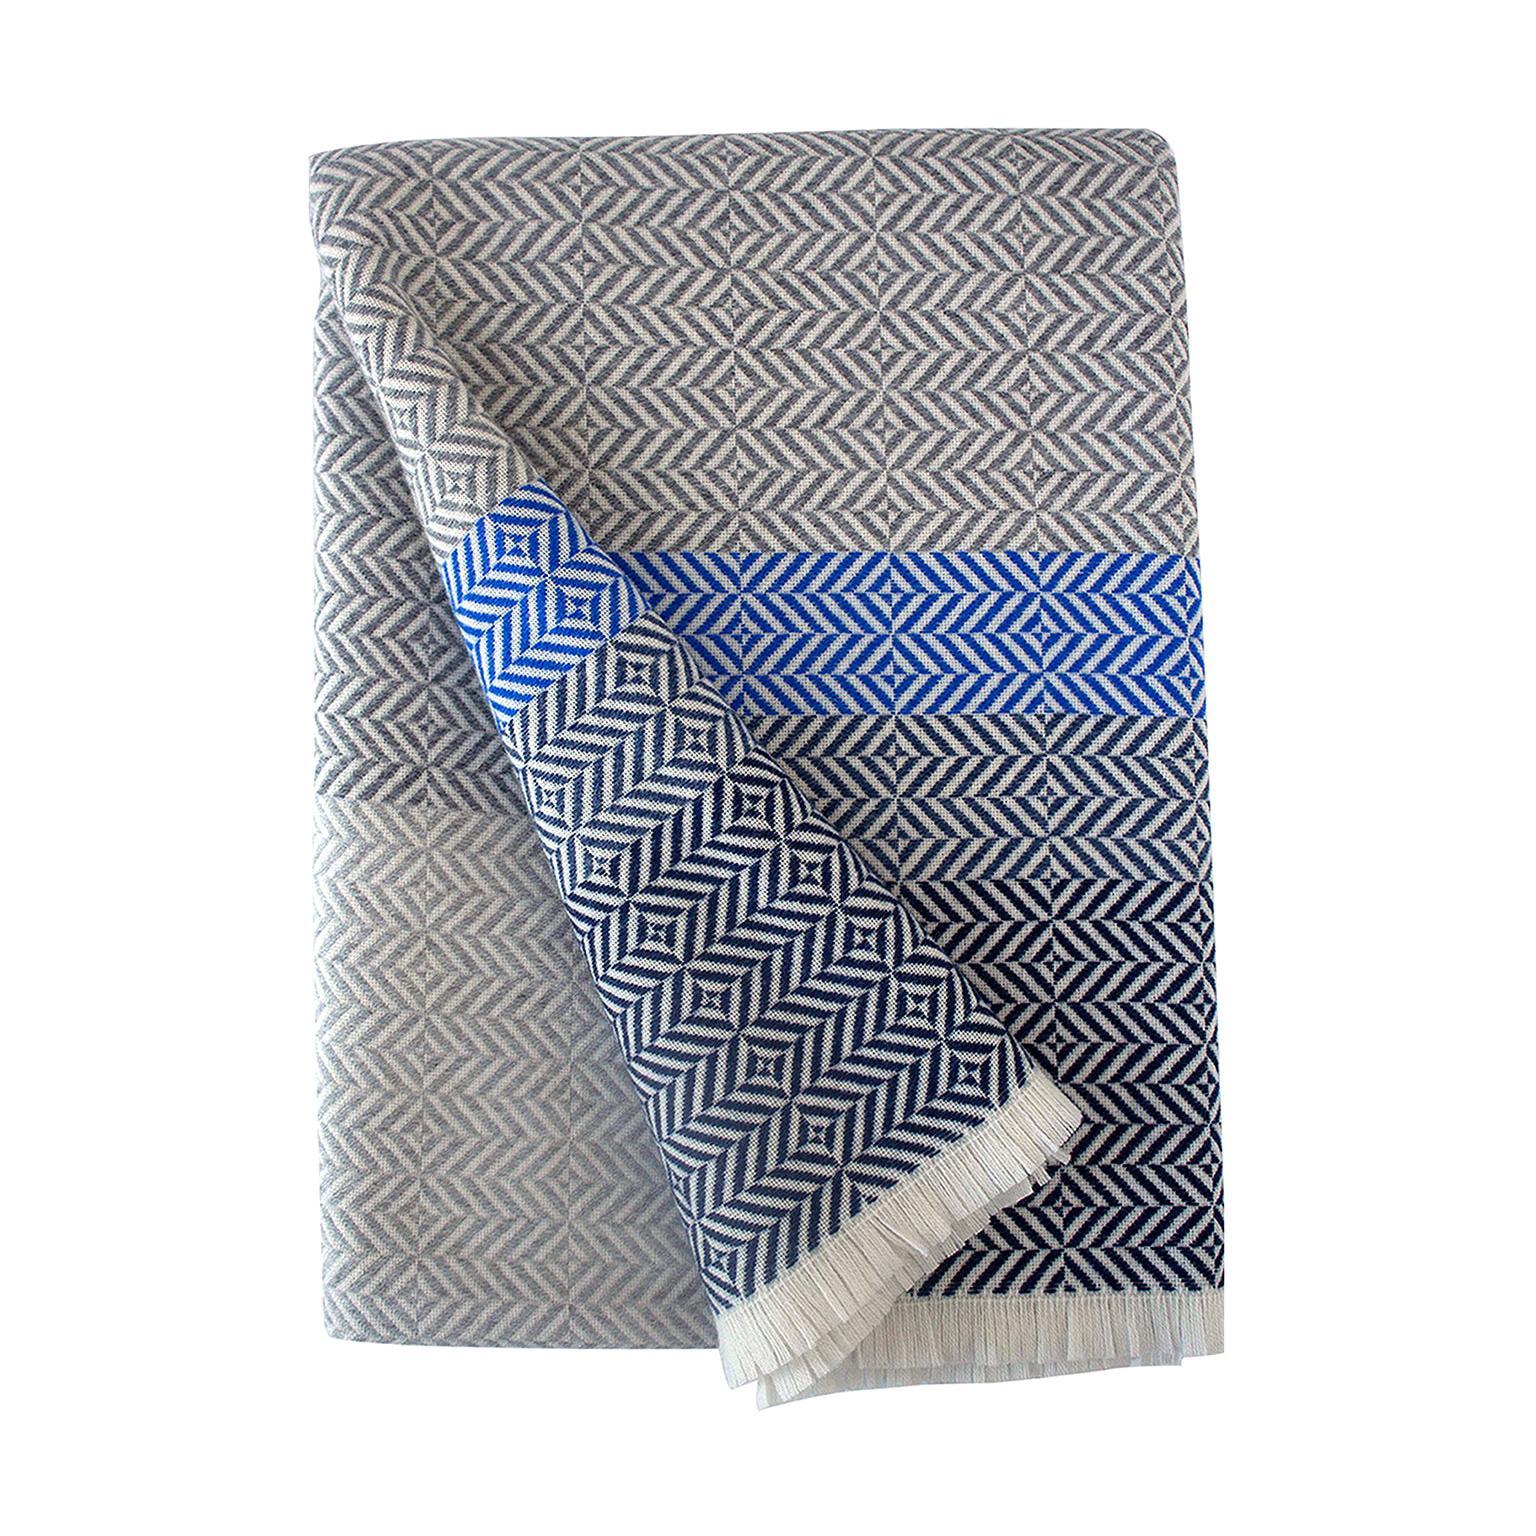 'Uccle' Woven Block Geometric Merino Wool Throw, Indigo/Colbalt Blue/Greys